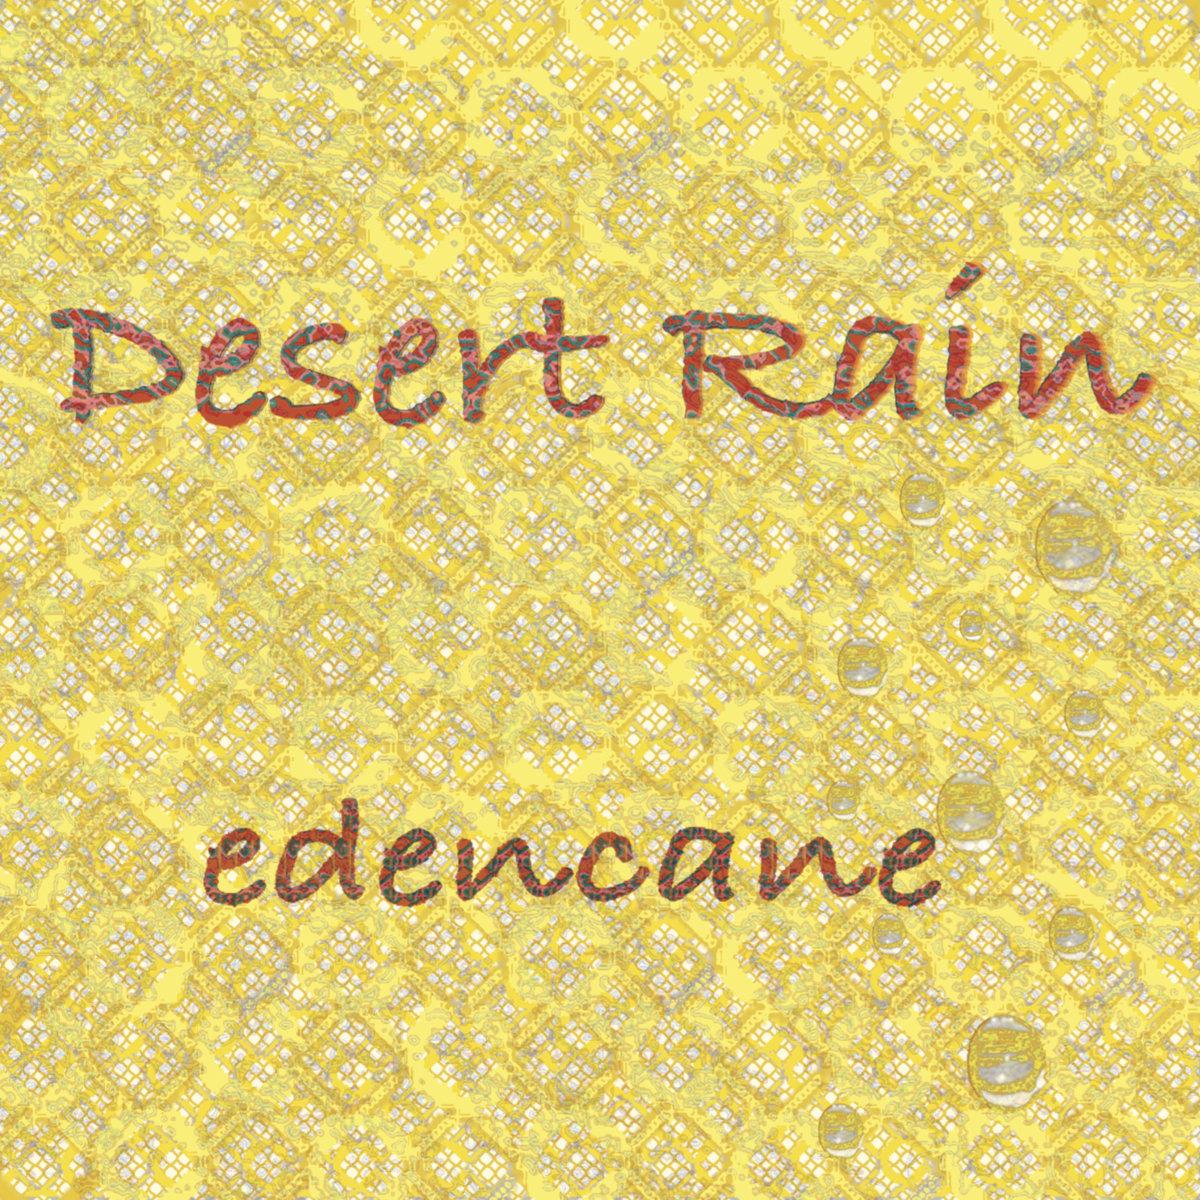 Free download ost love rain full album.